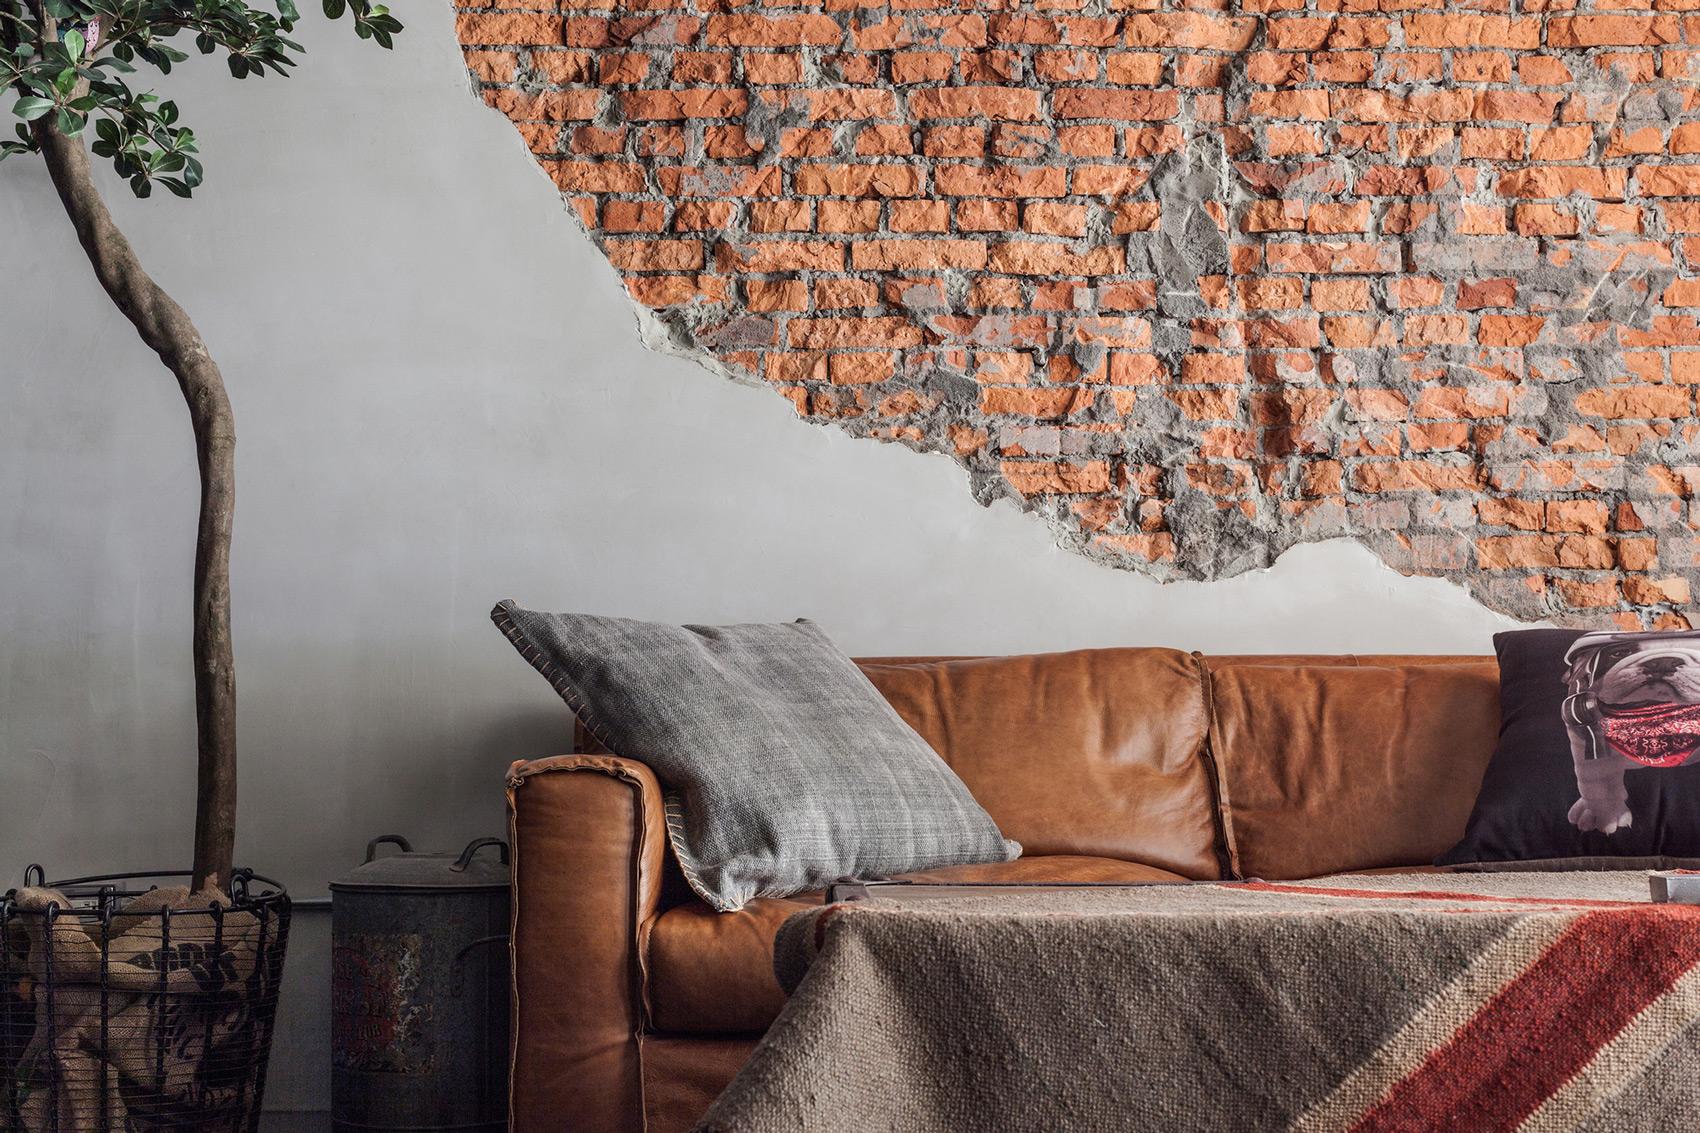 Apartment Refurbishment / CHI-TORCH Interior Design (10)